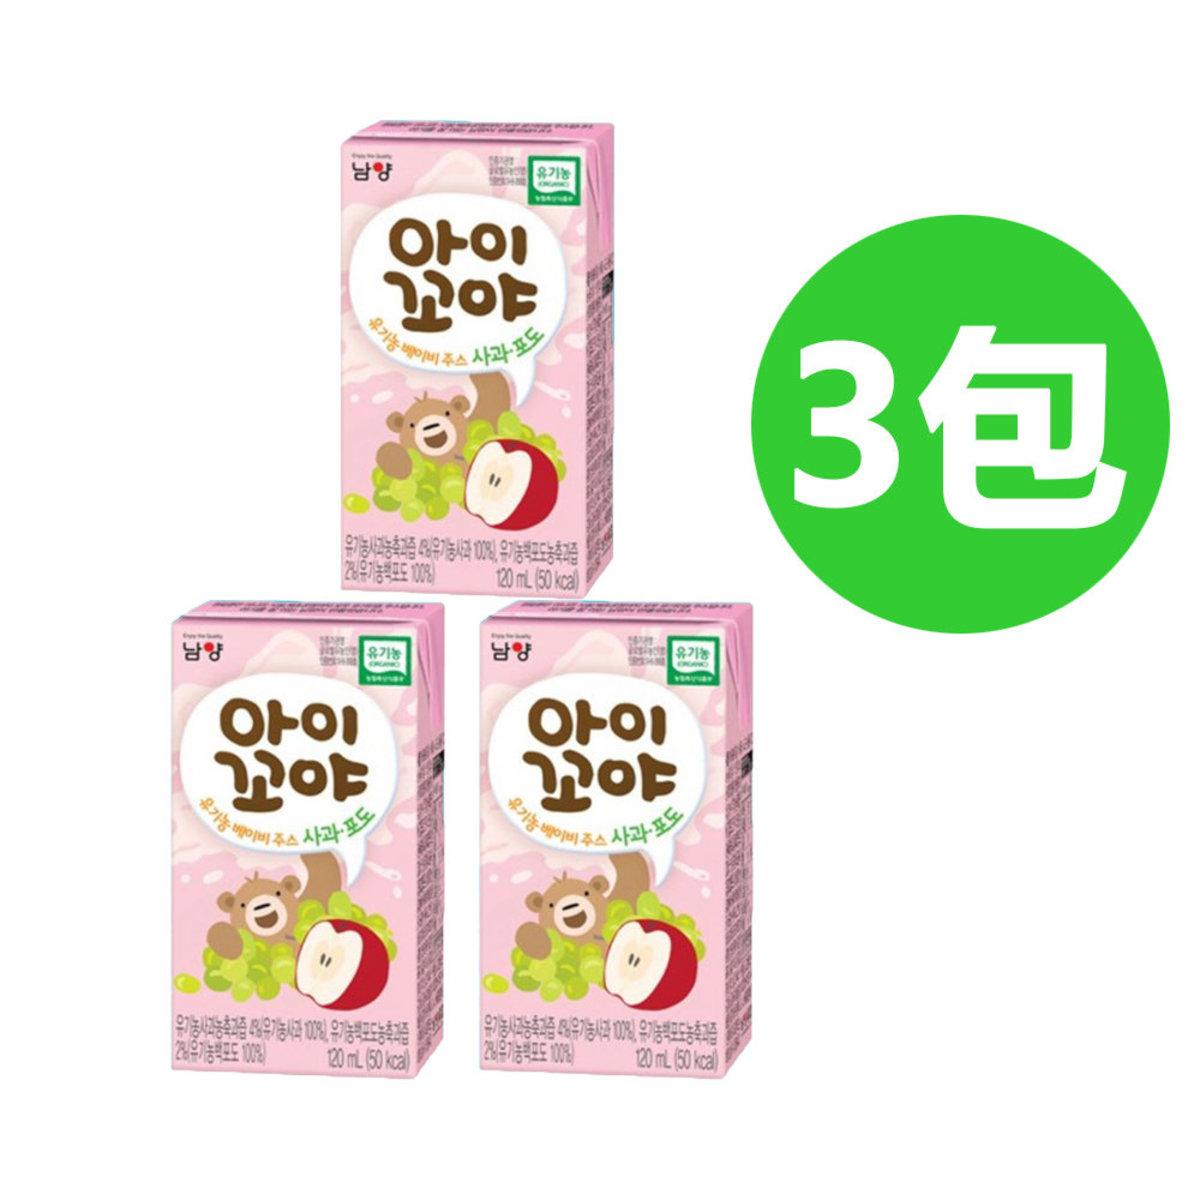 Namyang Organic Baby Juice (Apples & Grapes Flavour) (3 packs)